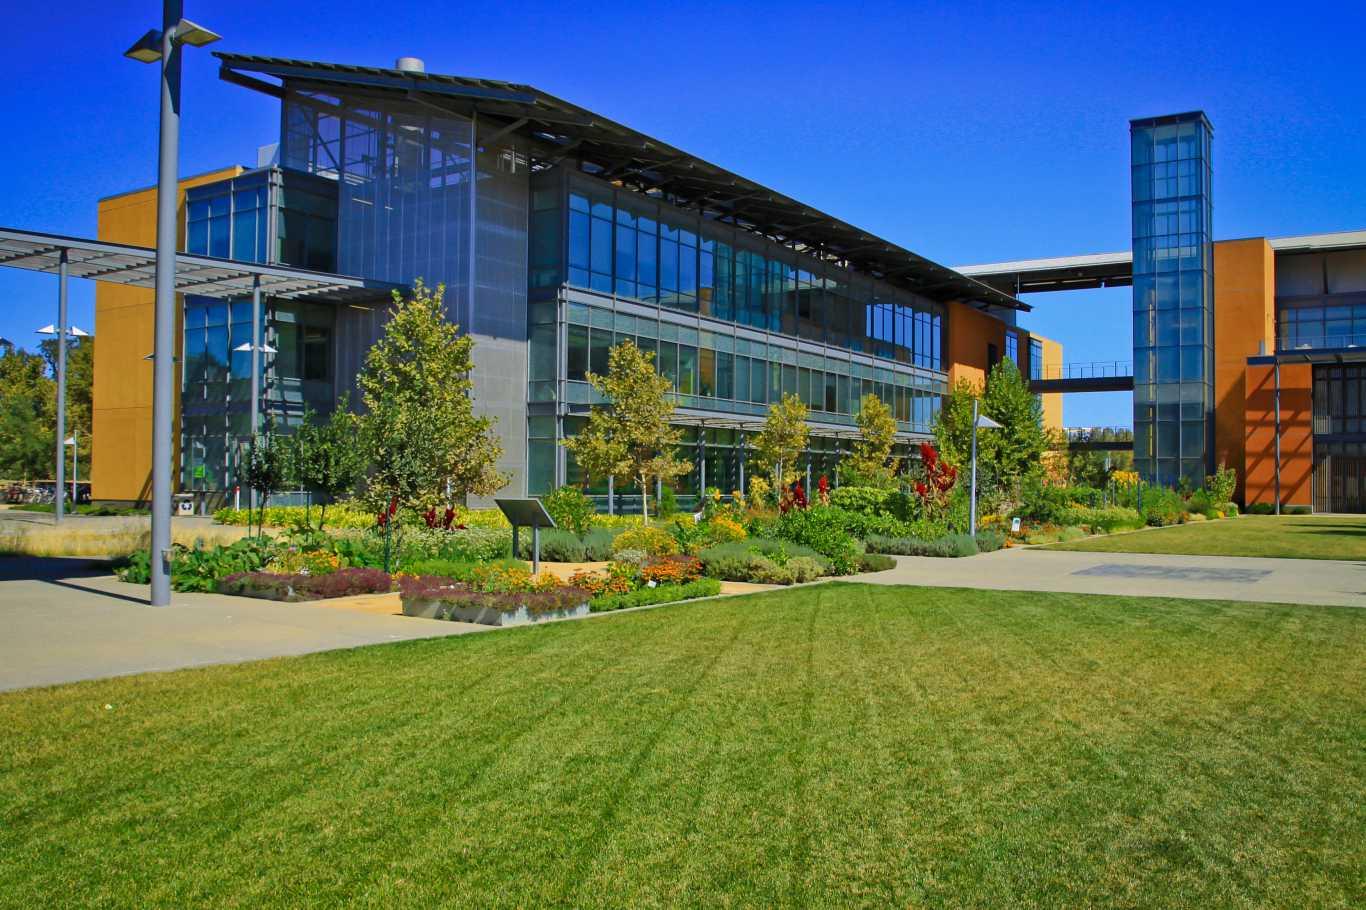 Tutoring Services at the University of California - Davis